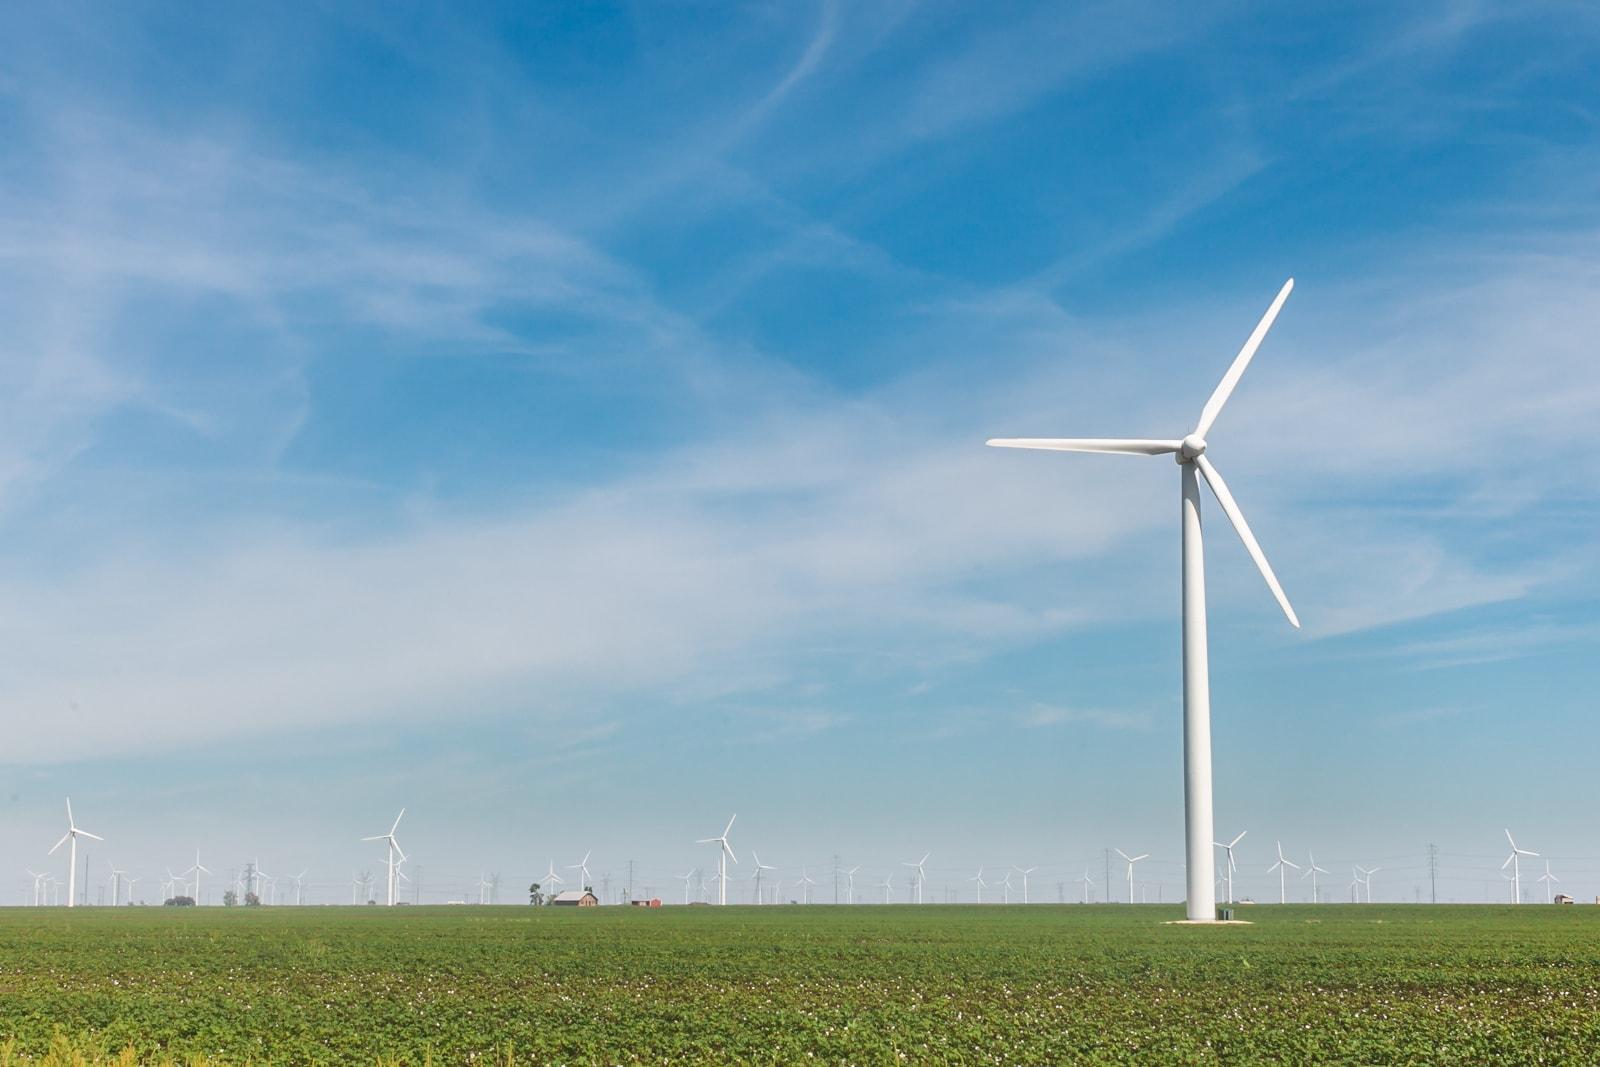 Wind turbines at the West Texas wind farm